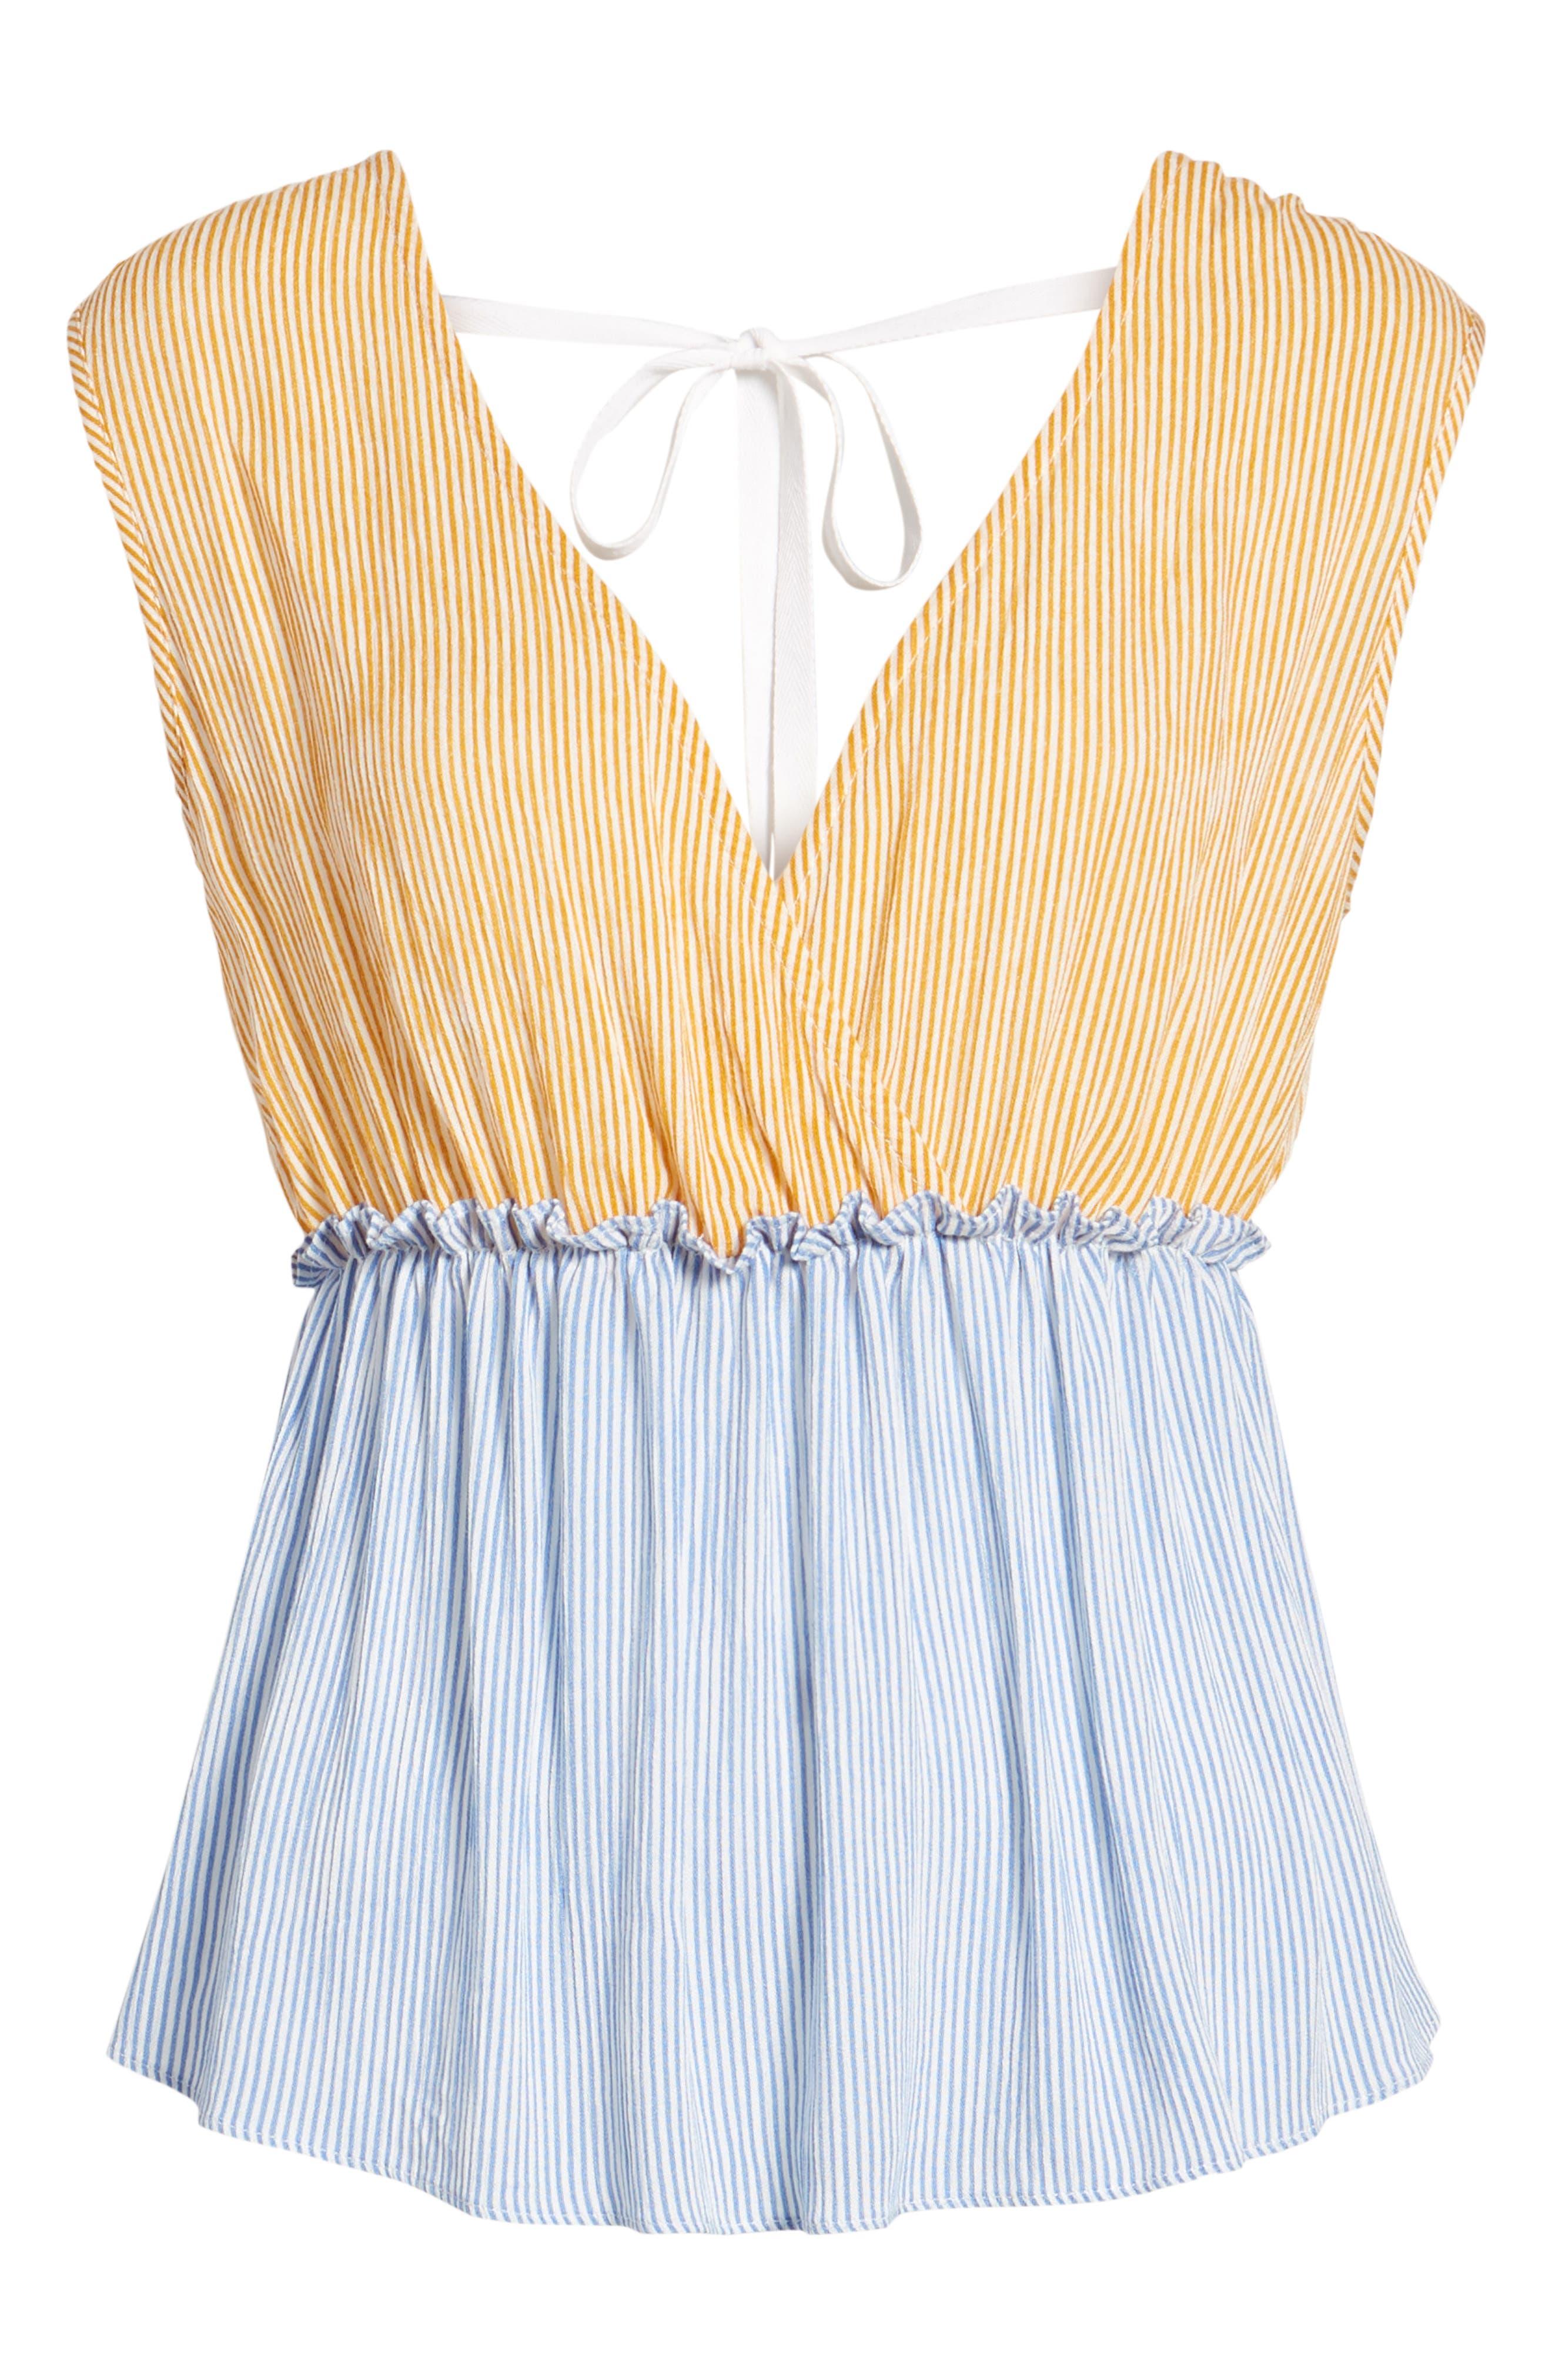 Mixed Stripe Tie Back Top,                             Alternate thumbnail 7, color,                             Blue Bell Devan Stripe